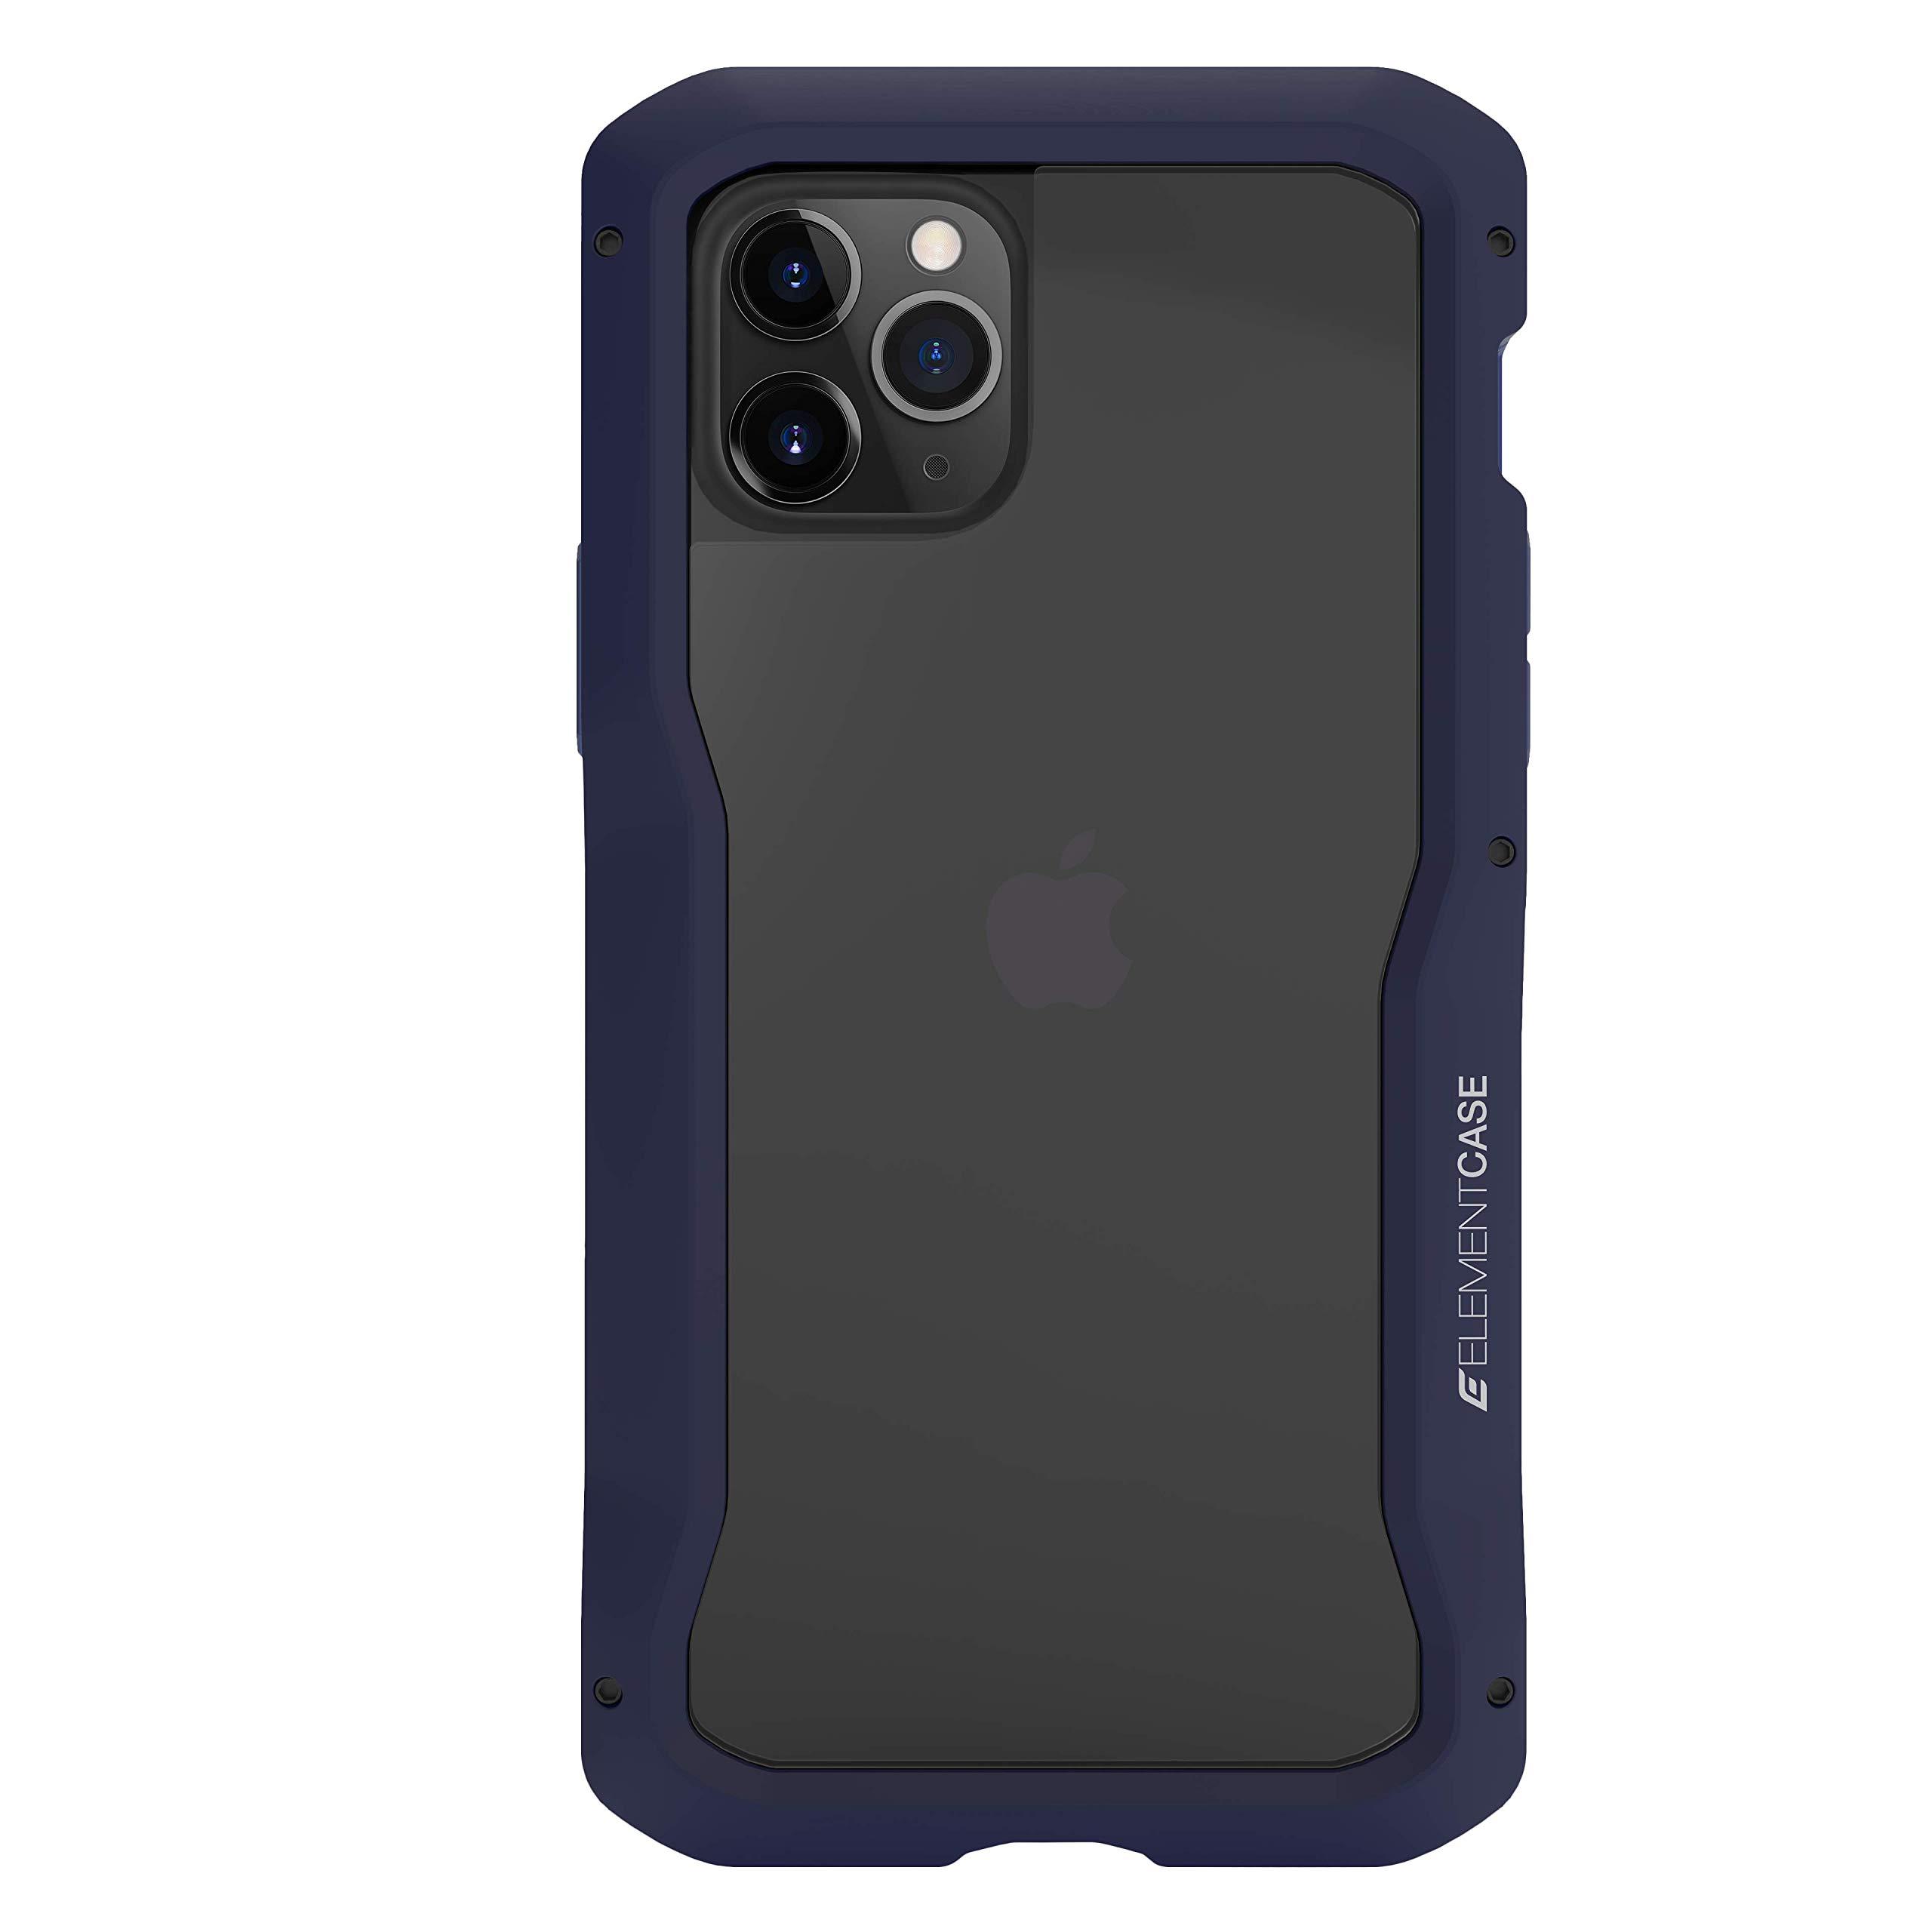 Element Case Vapor S Drop Tested Case for iPhone 11 Pro - Blue (EMT-322-226EX-02)